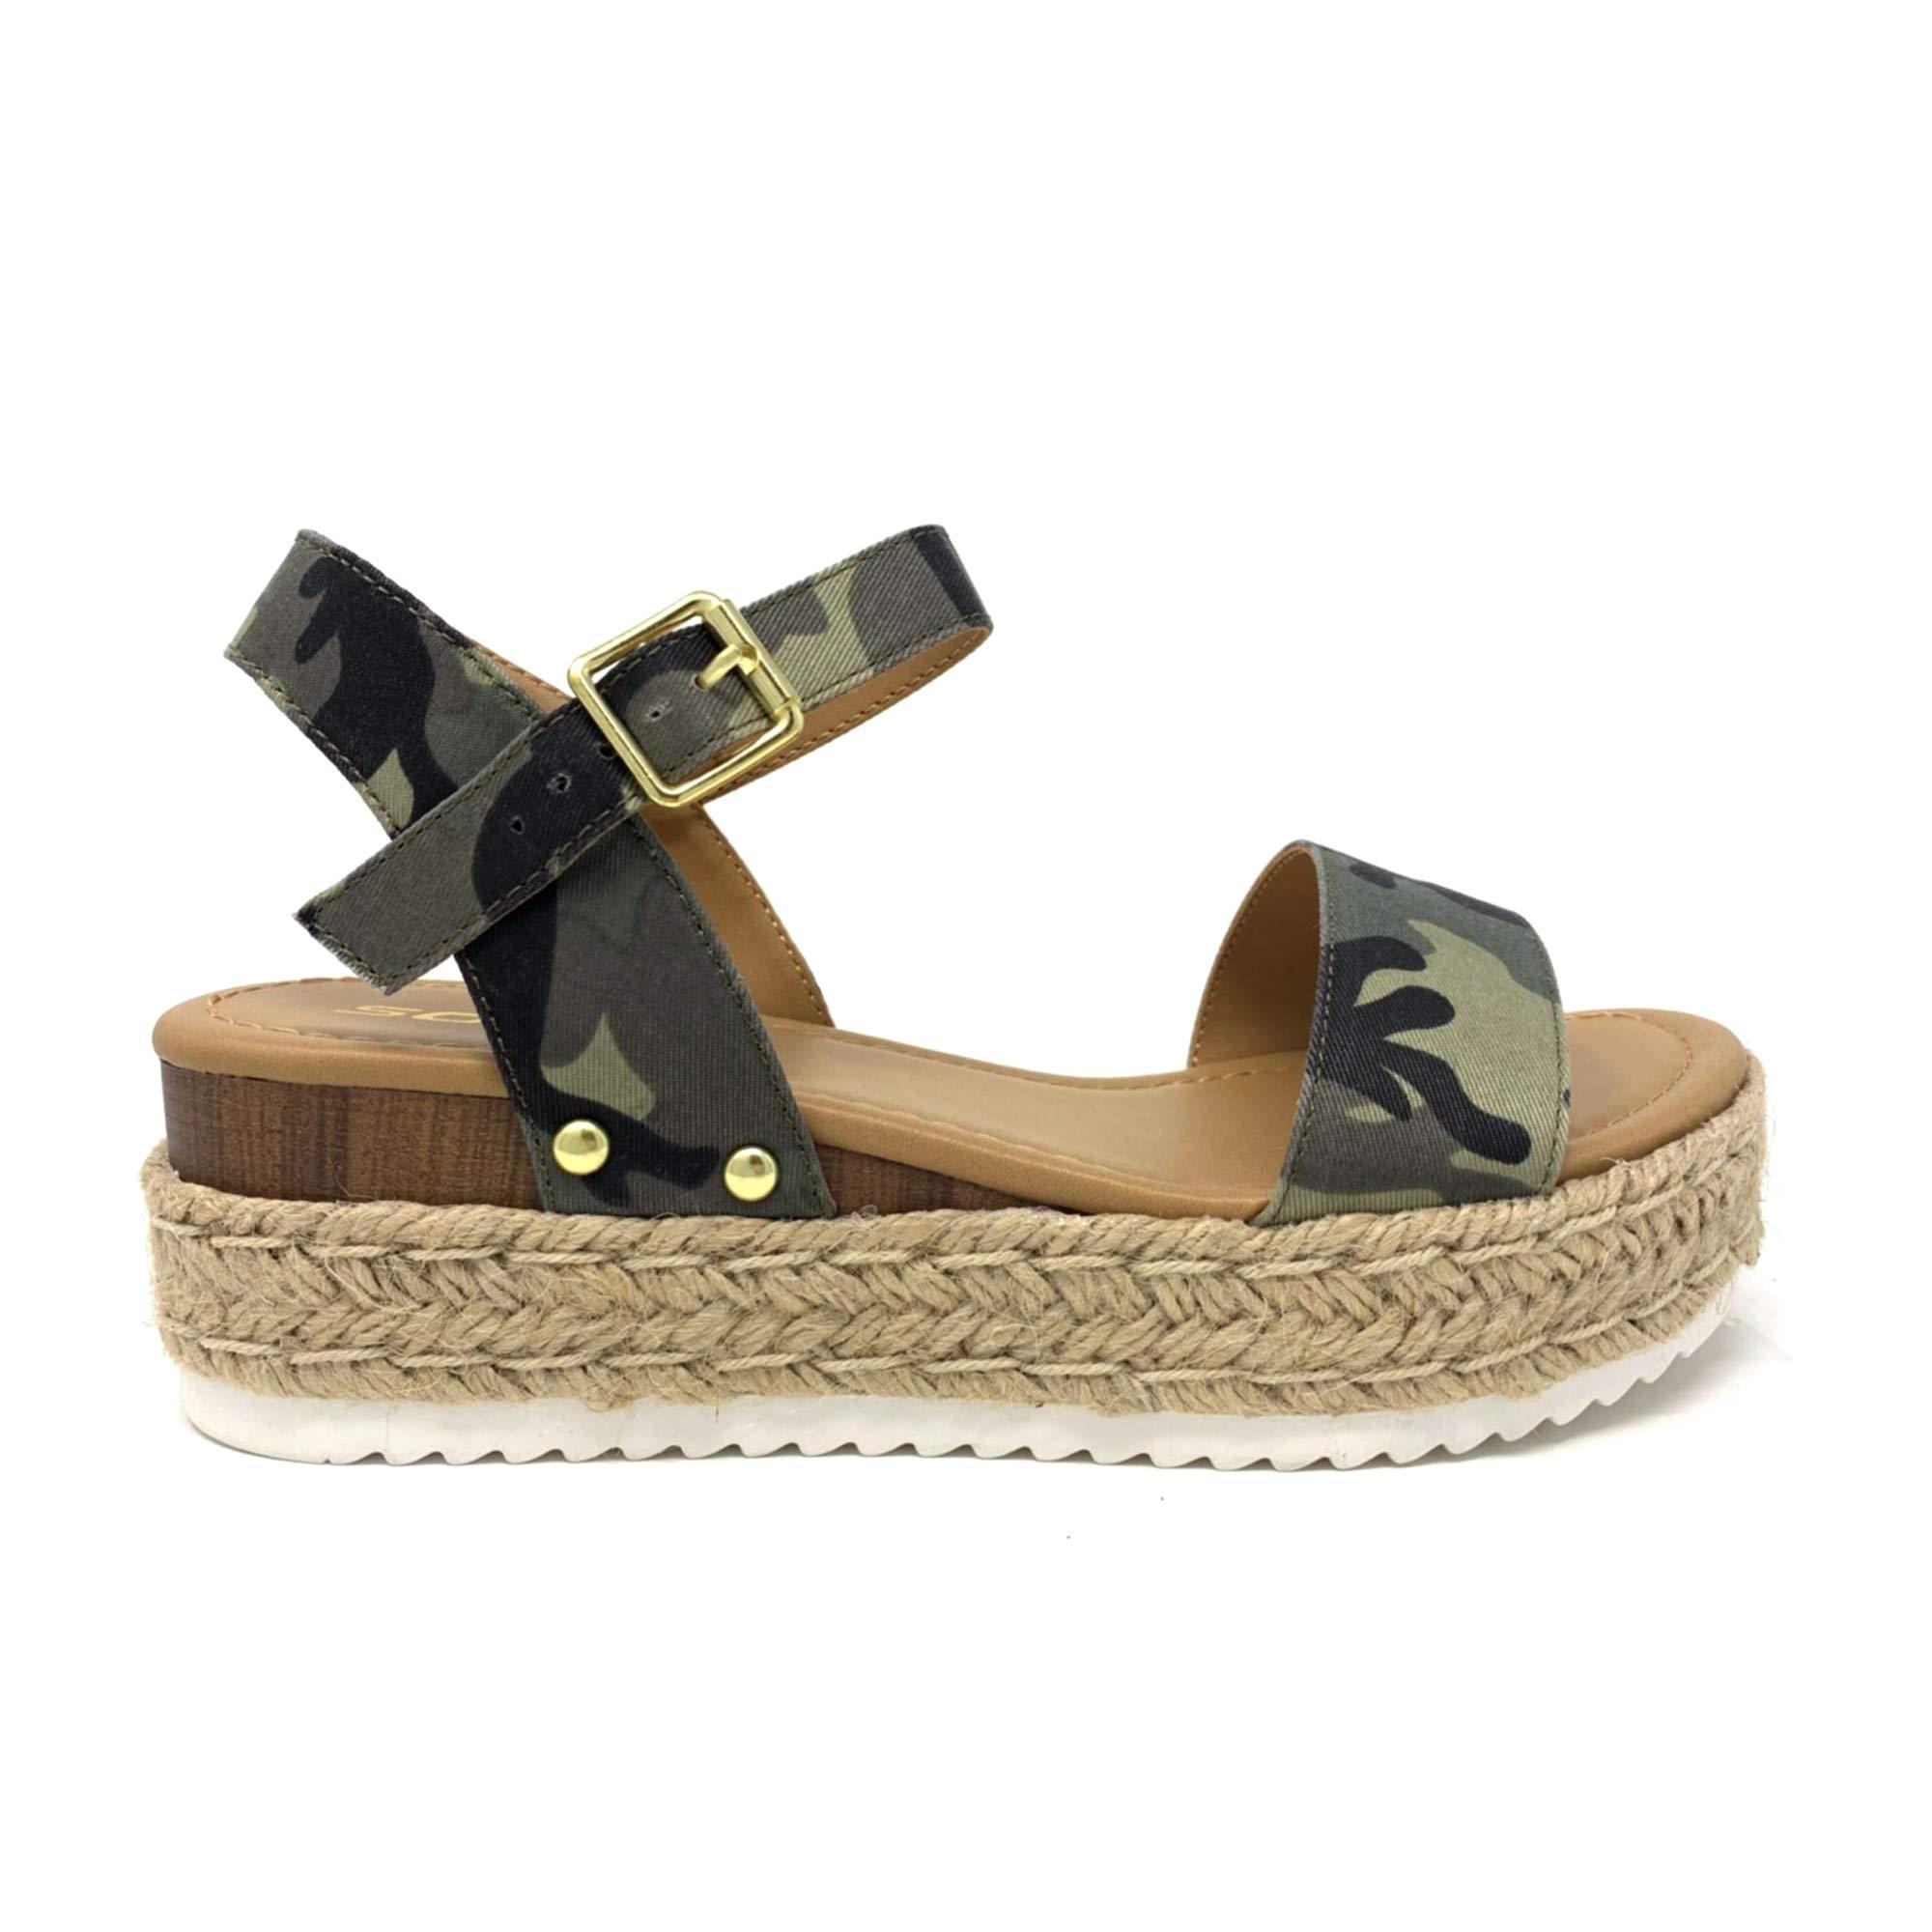 SODA Clip Tan Espadrille Flatform Sandals (5.5 M US, Camo)